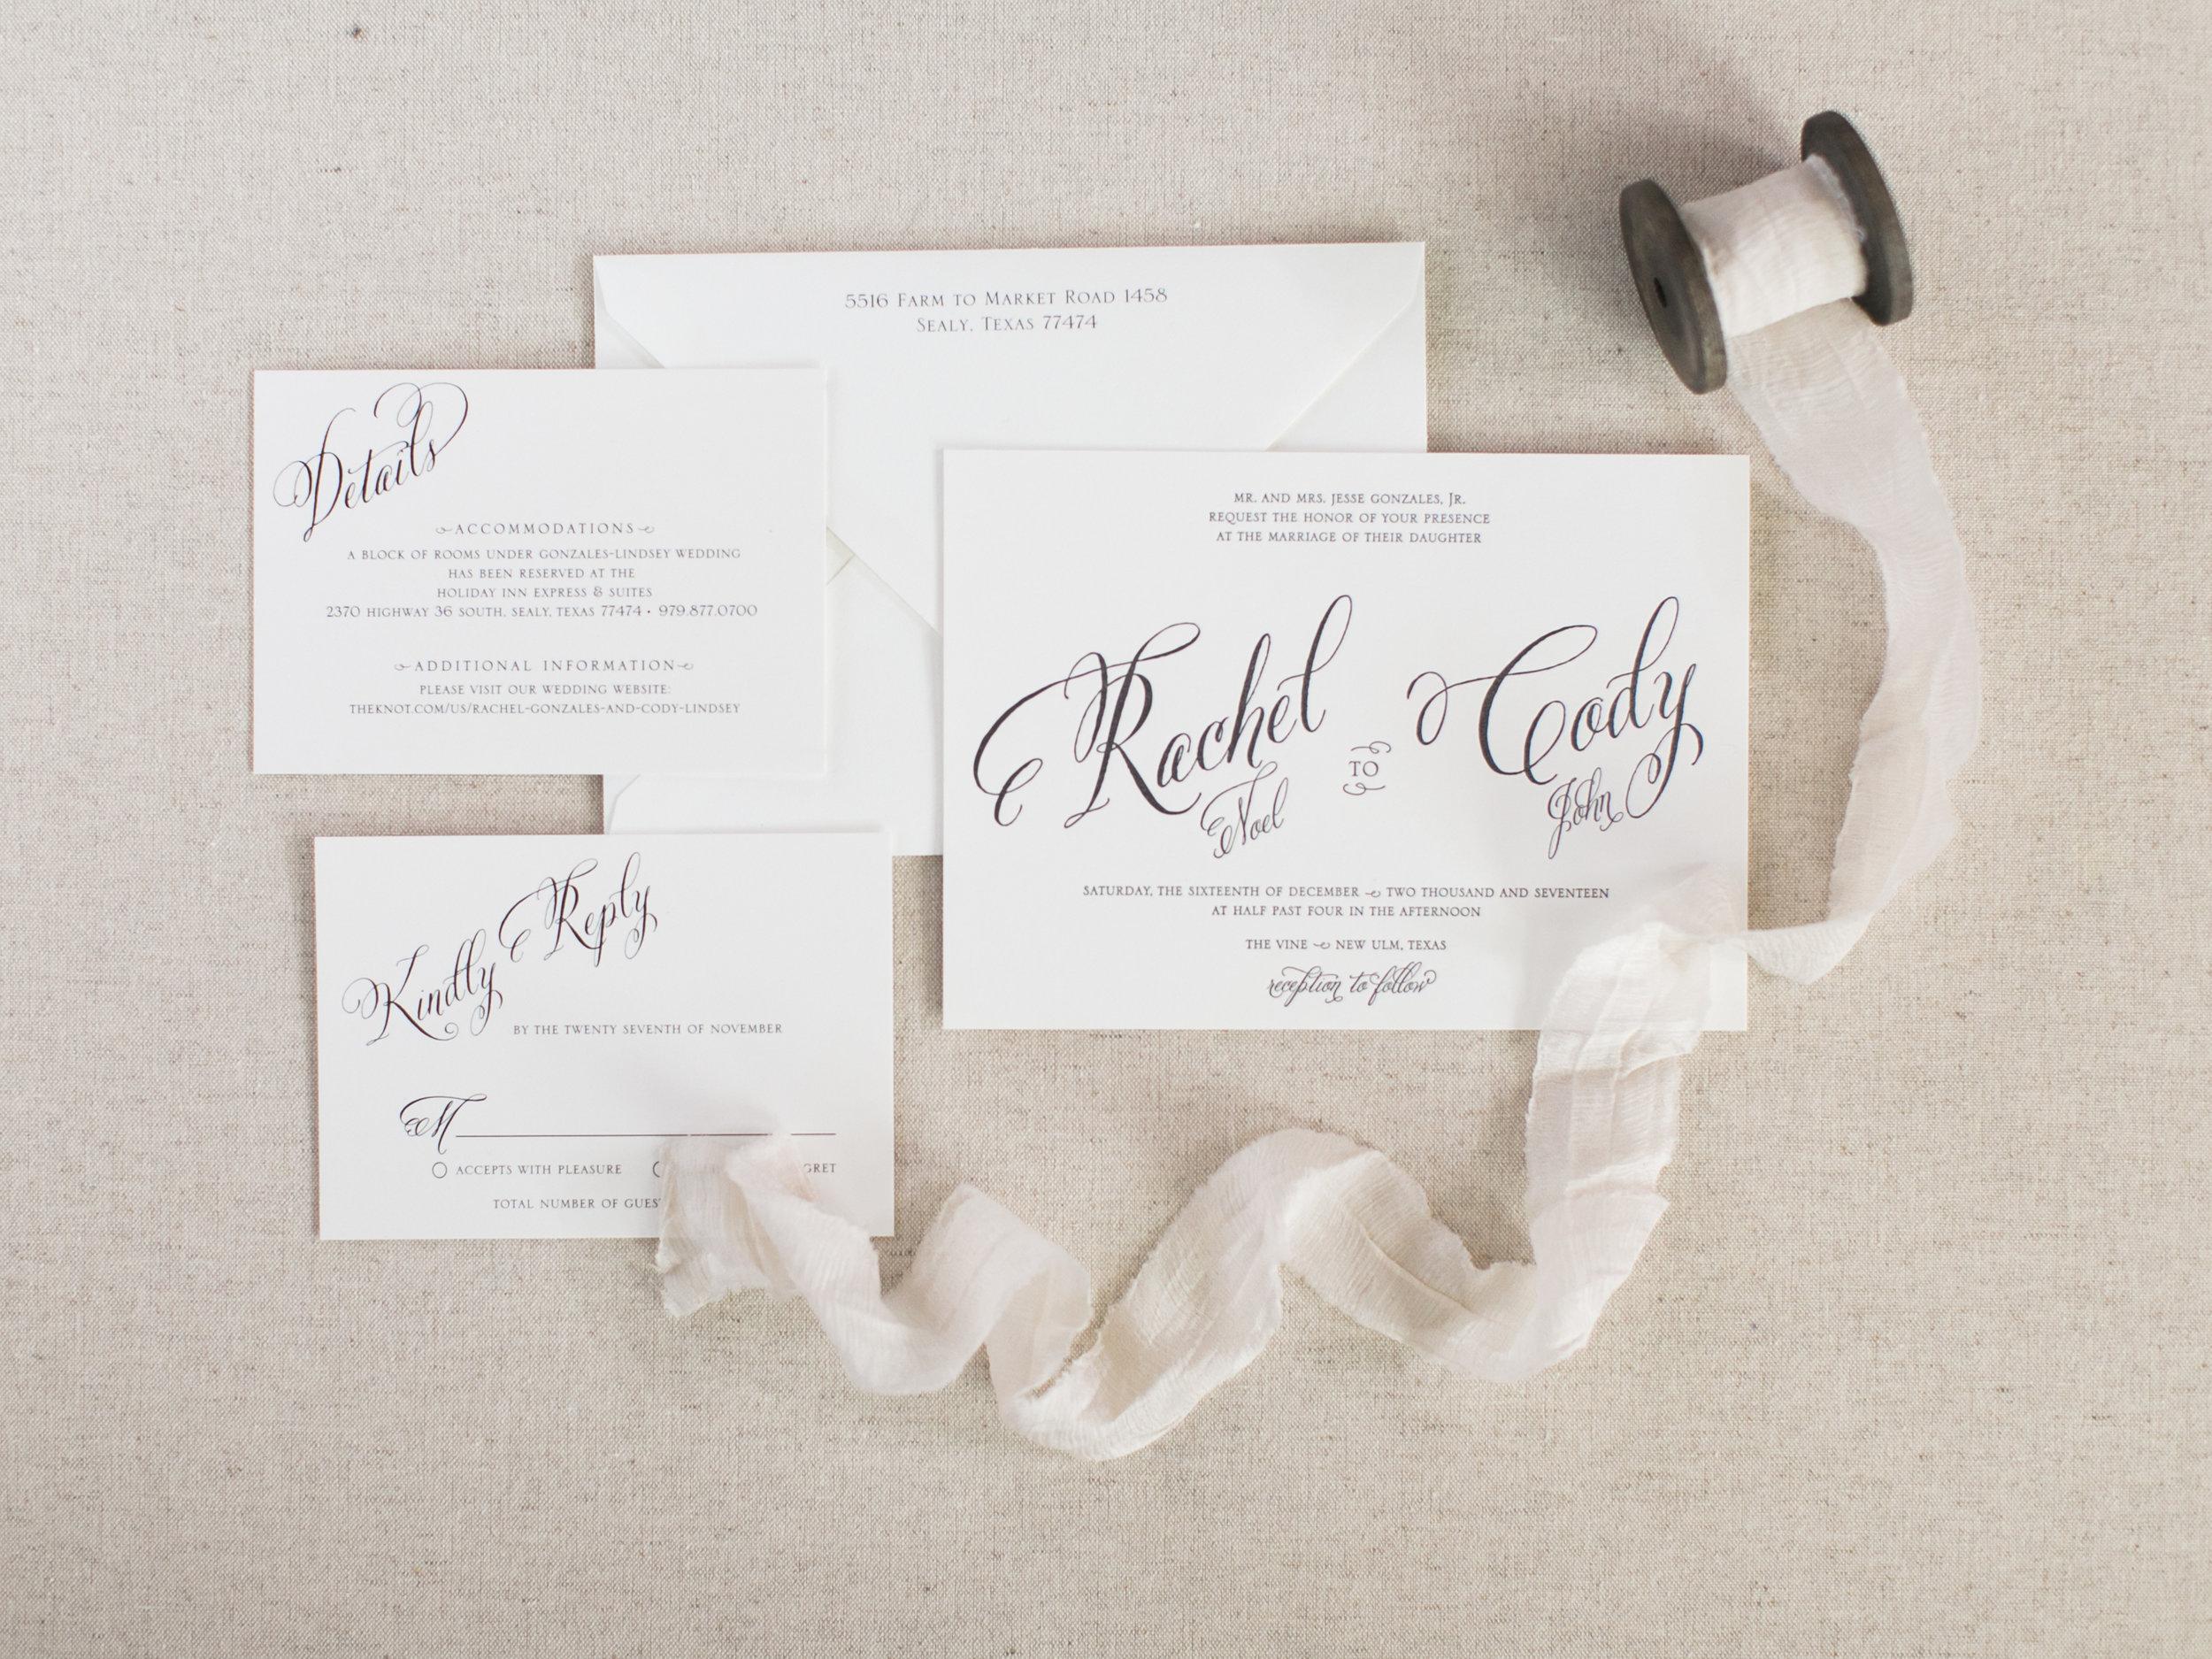 letterpress wedding invitation with black ink.jpg